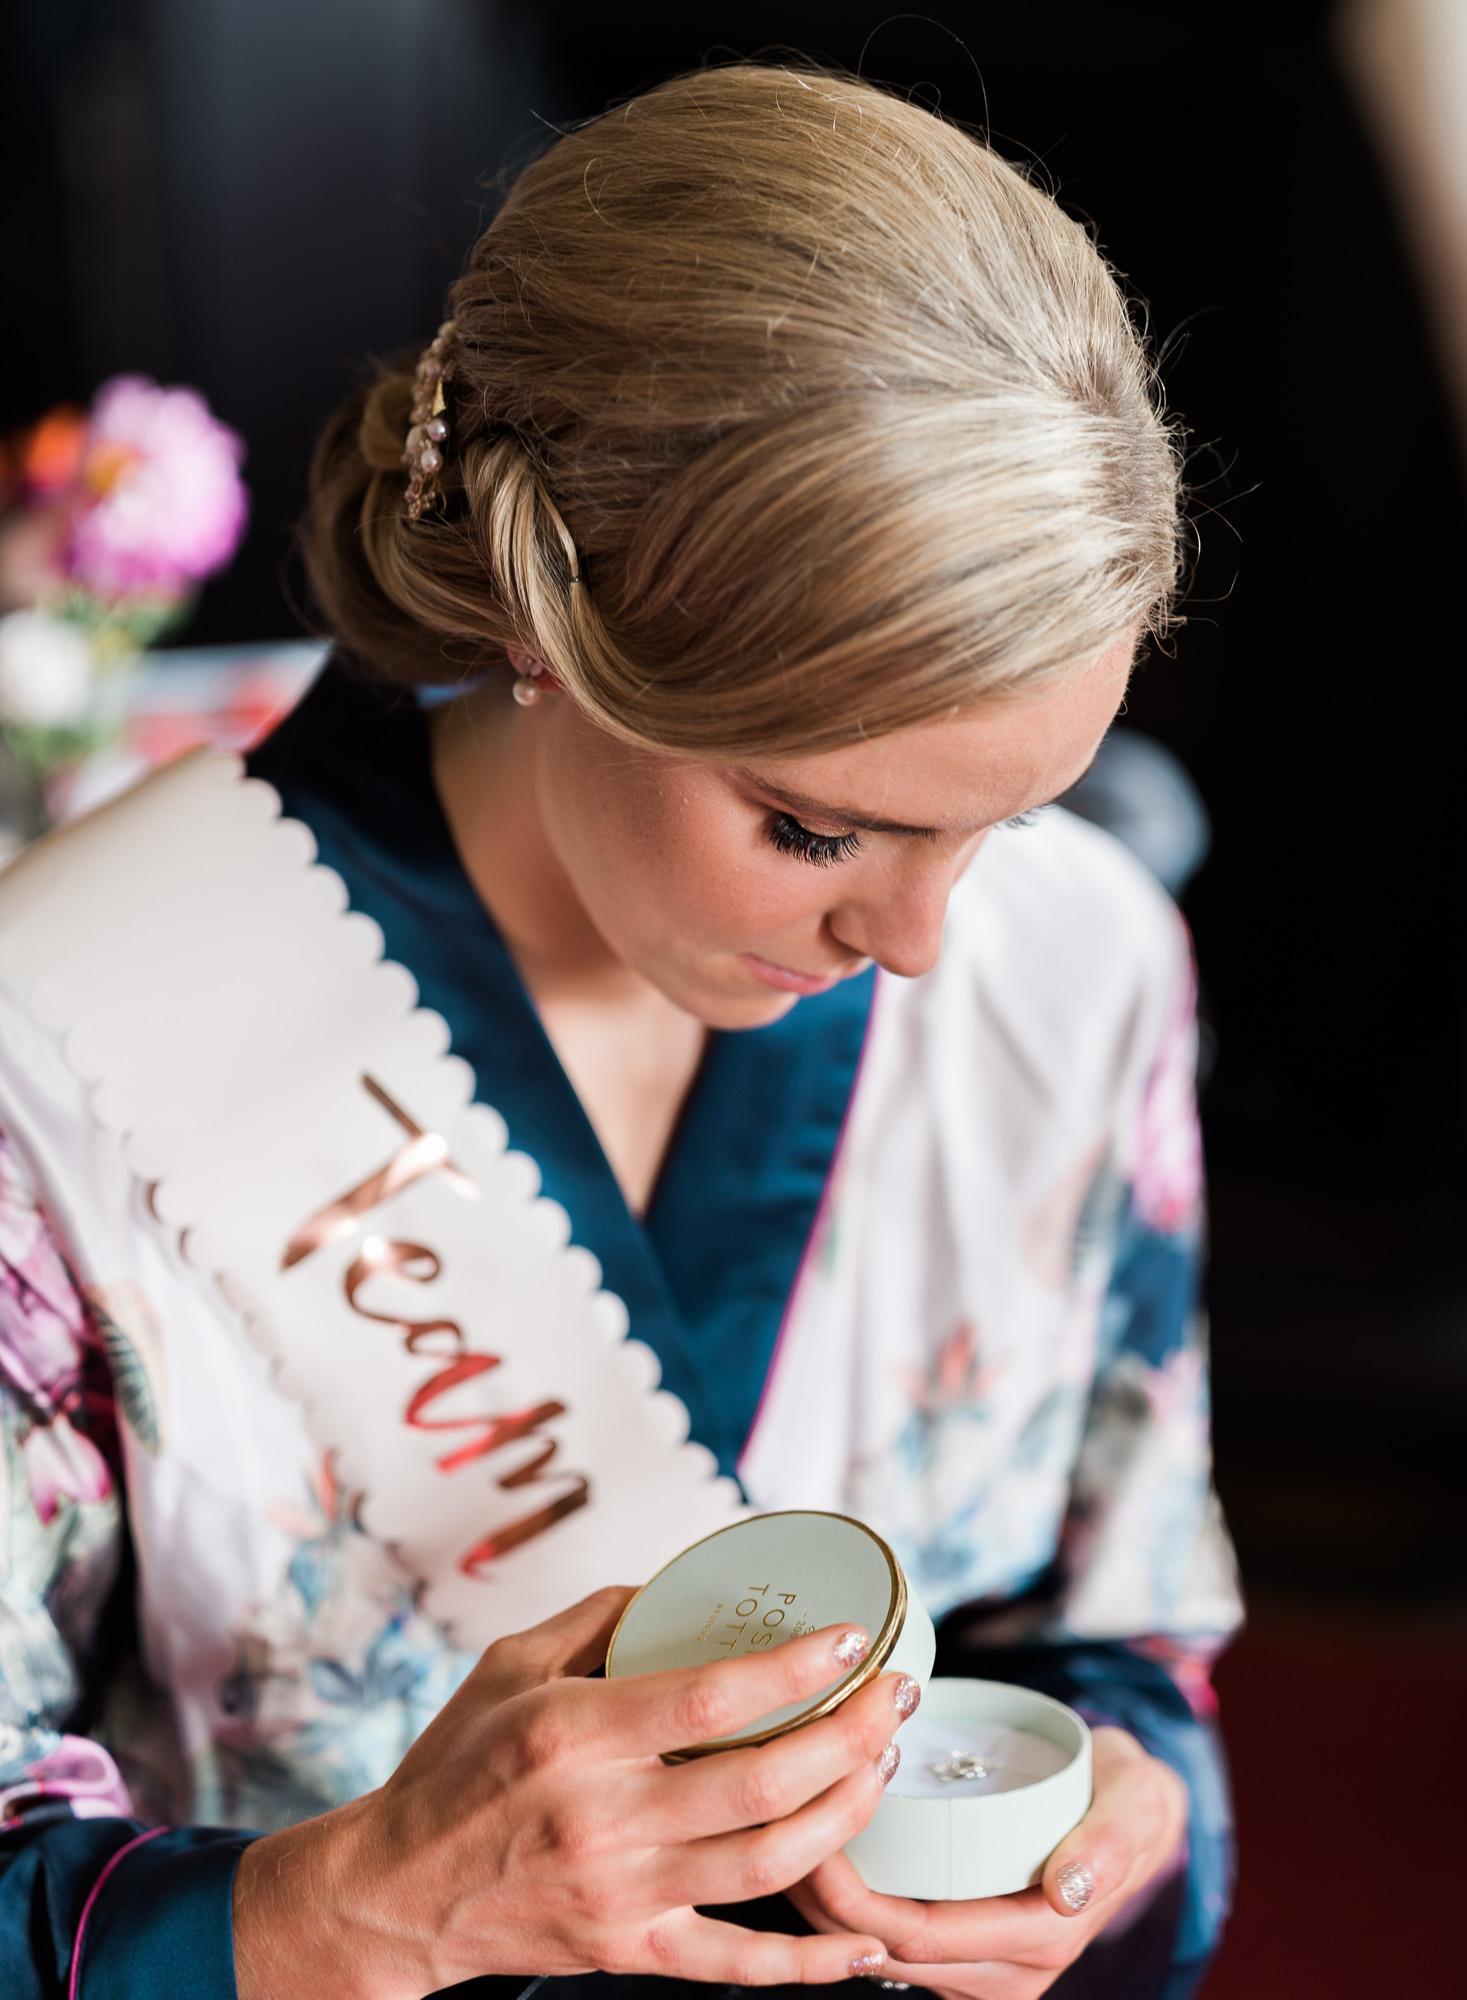 scottish_wedding_blairquhan_castle-22.jpg